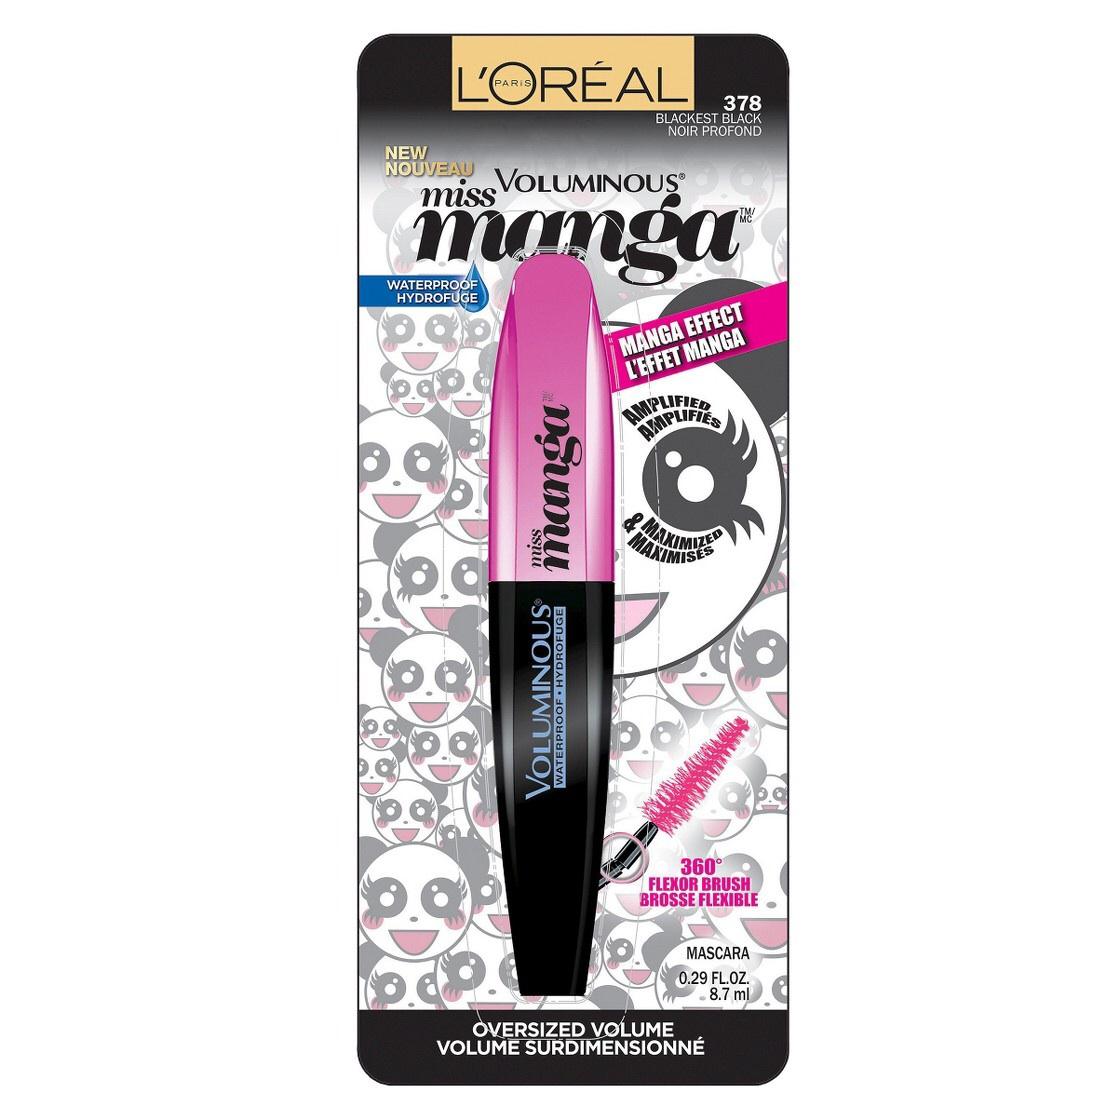 9dcb47e8bec ShopandBox - Buy LOreal Paris Voluminous Miss Manga Mascara from US